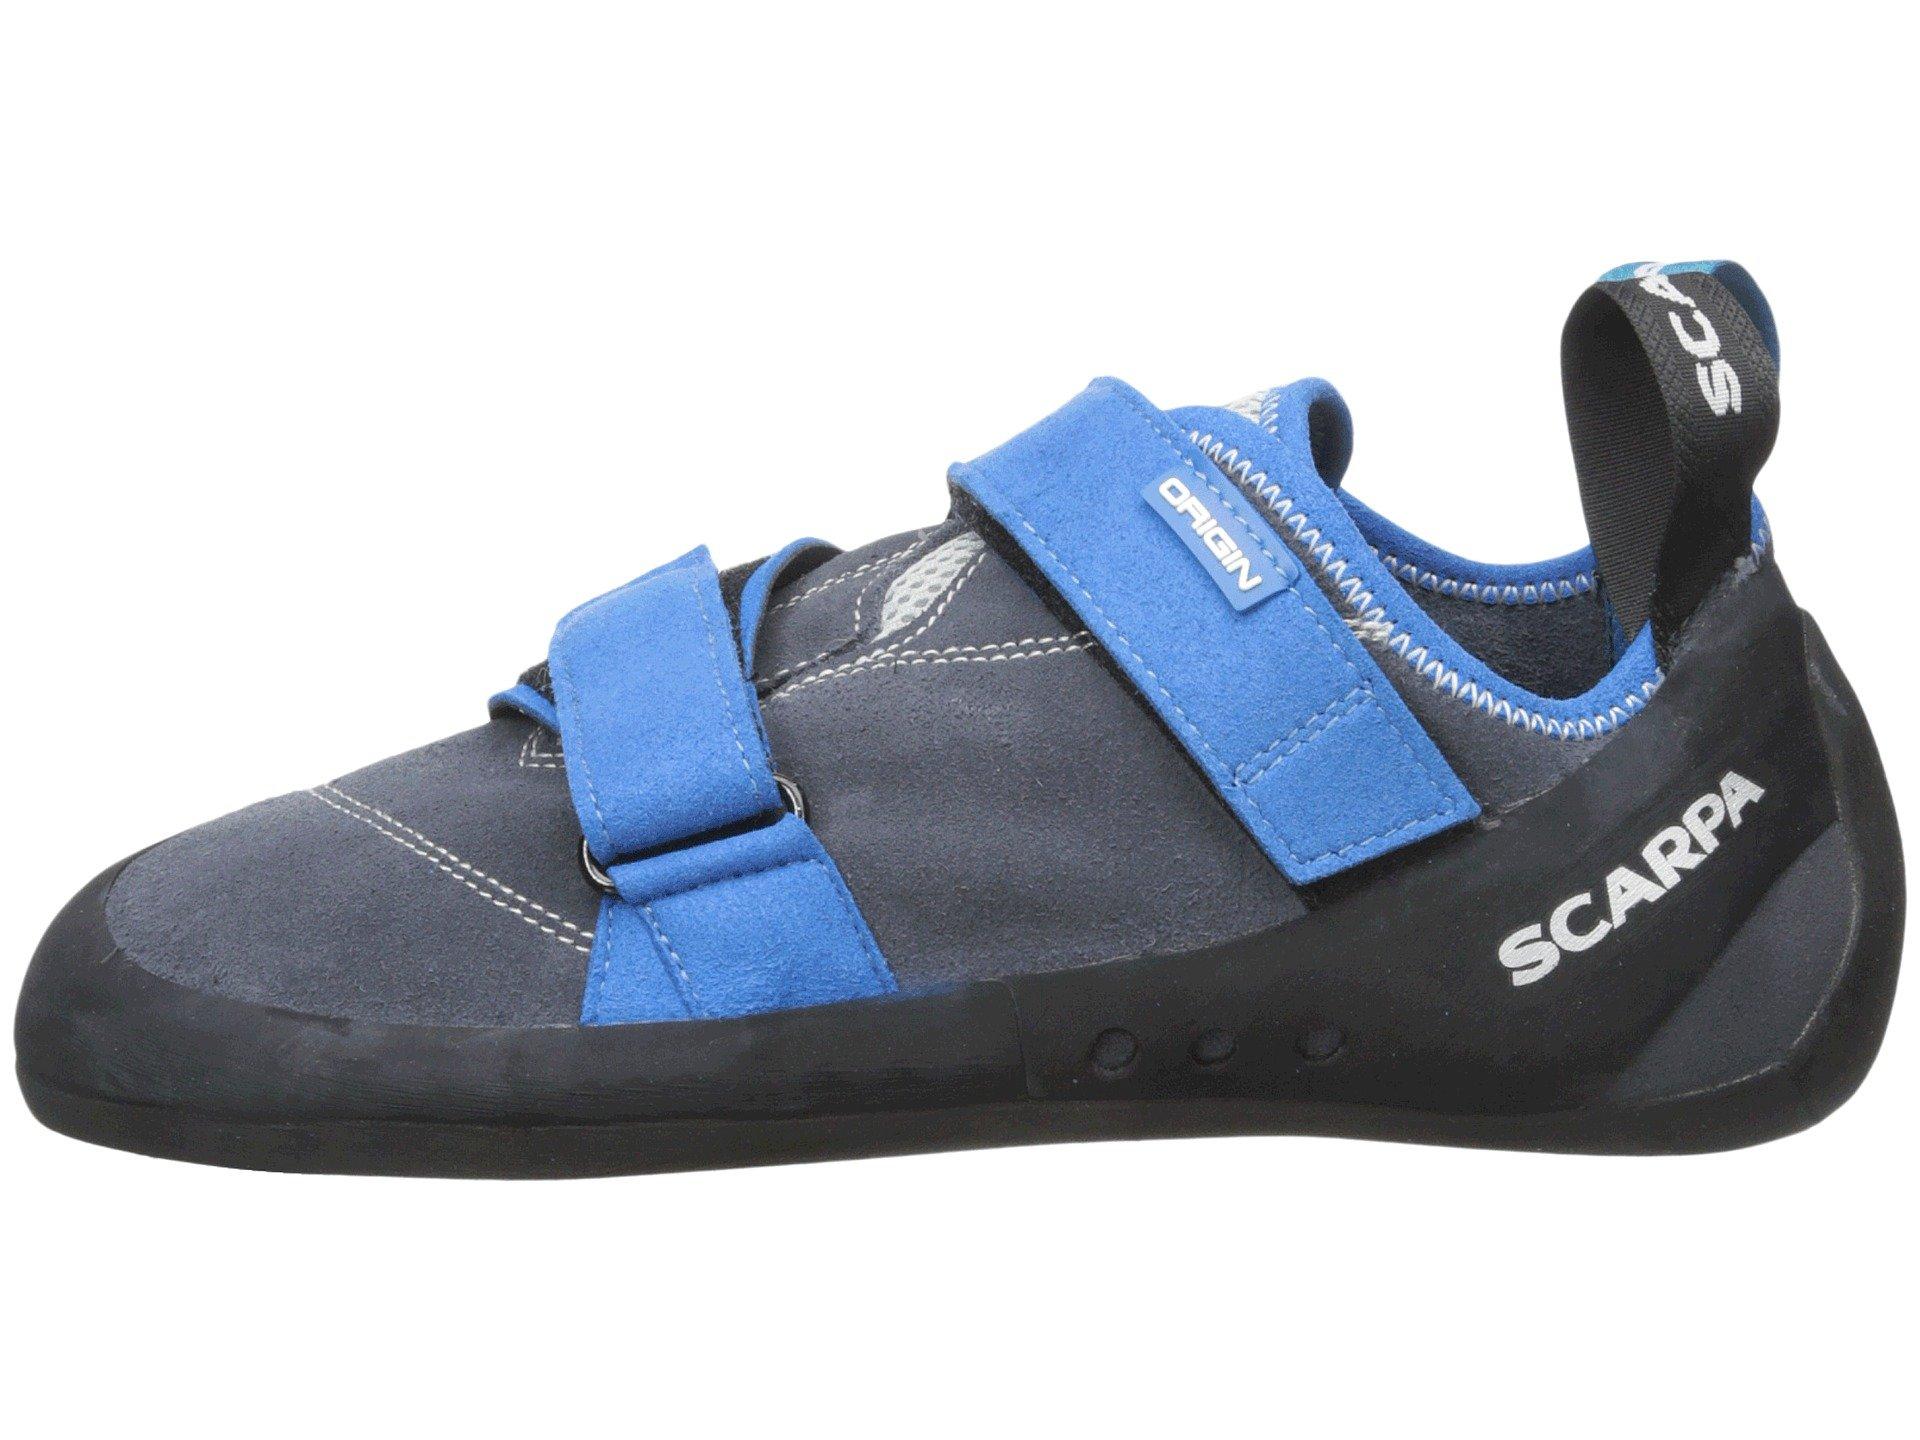 Gray Origin Scarpa Origin Scarpa Iron qwxBIqH6